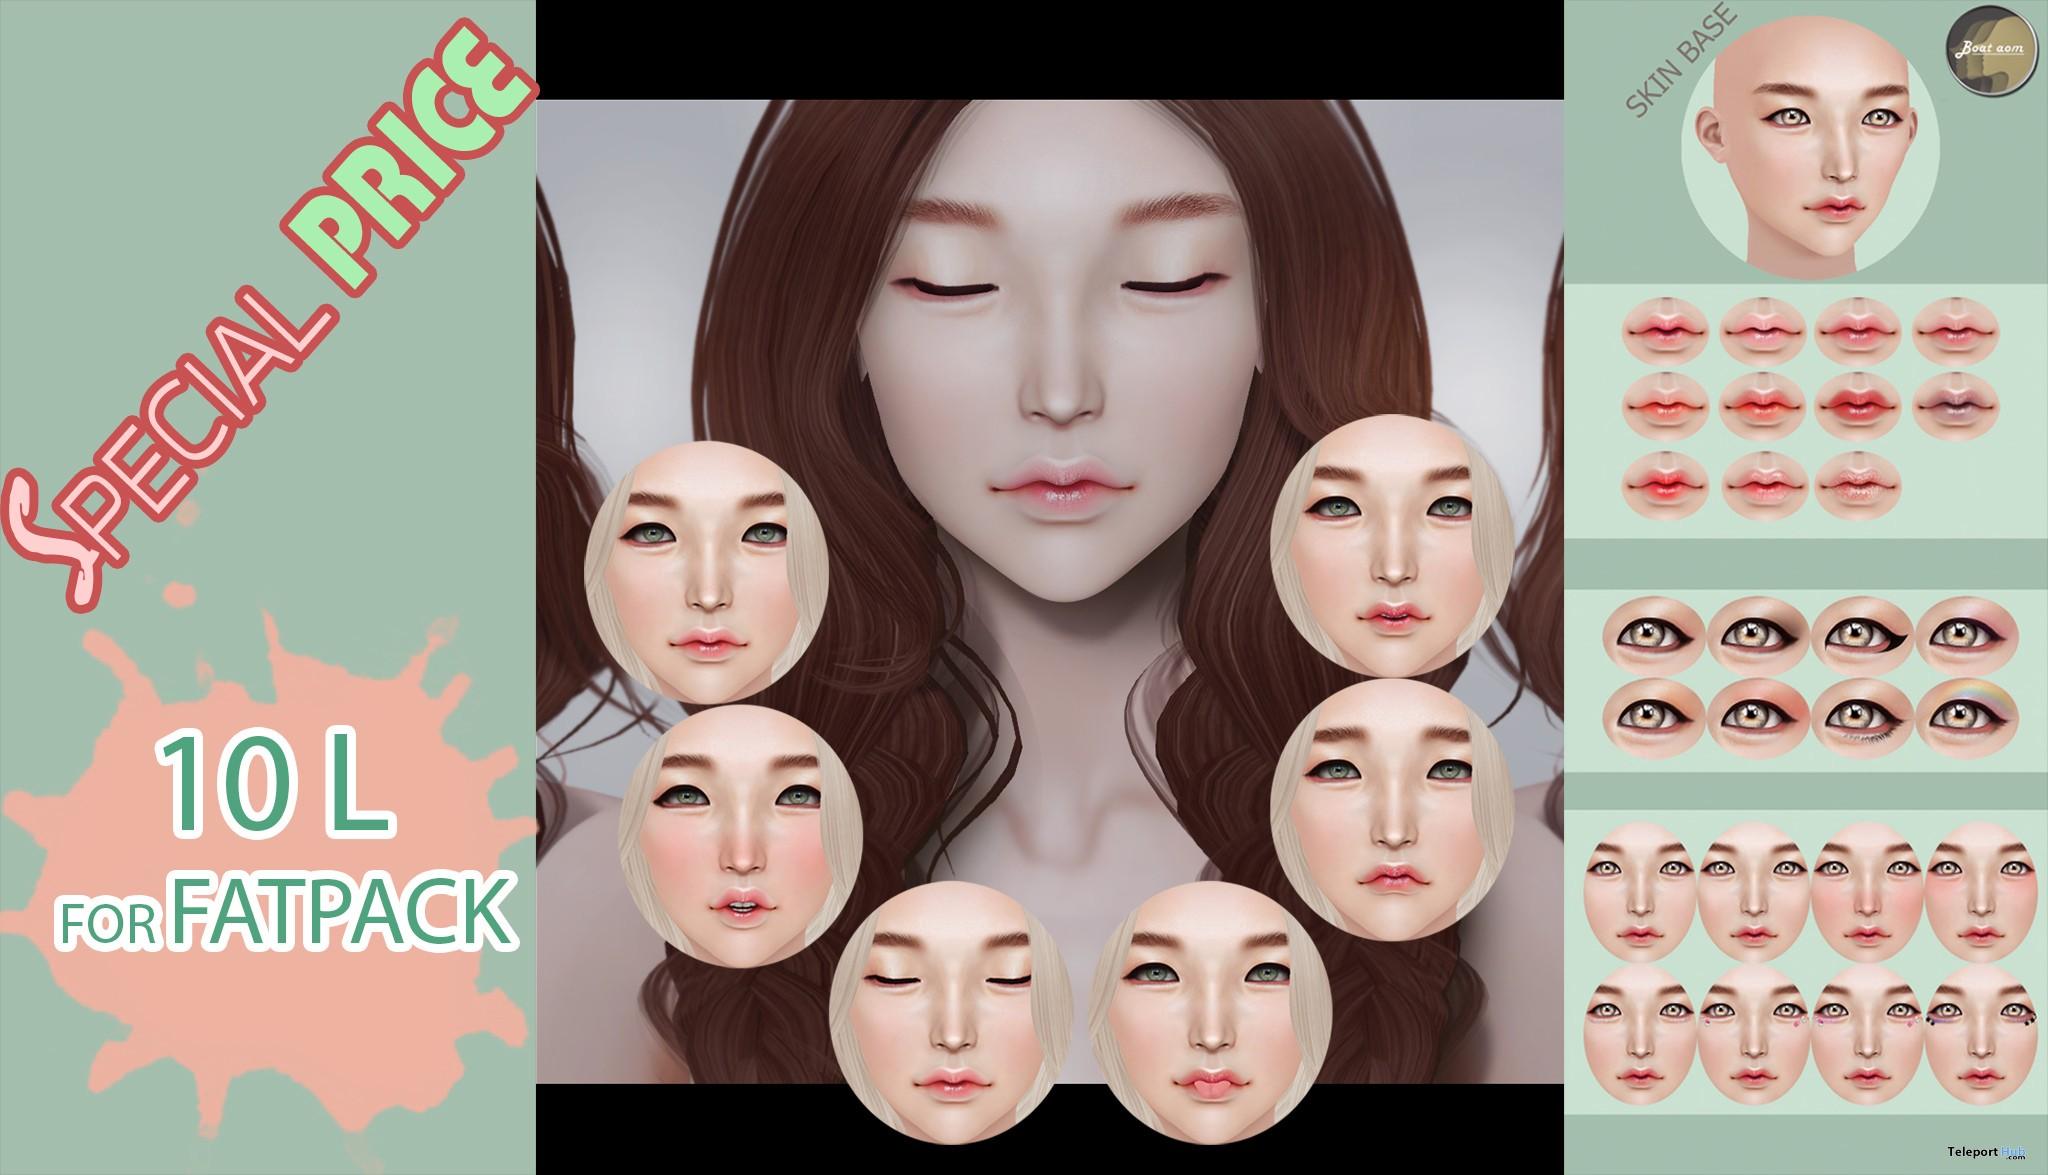 Takaru Mesh Head With Makeup Options Fatpack 10L Promo Gift by Baotaom - Teleport Hub - teleporthub.com